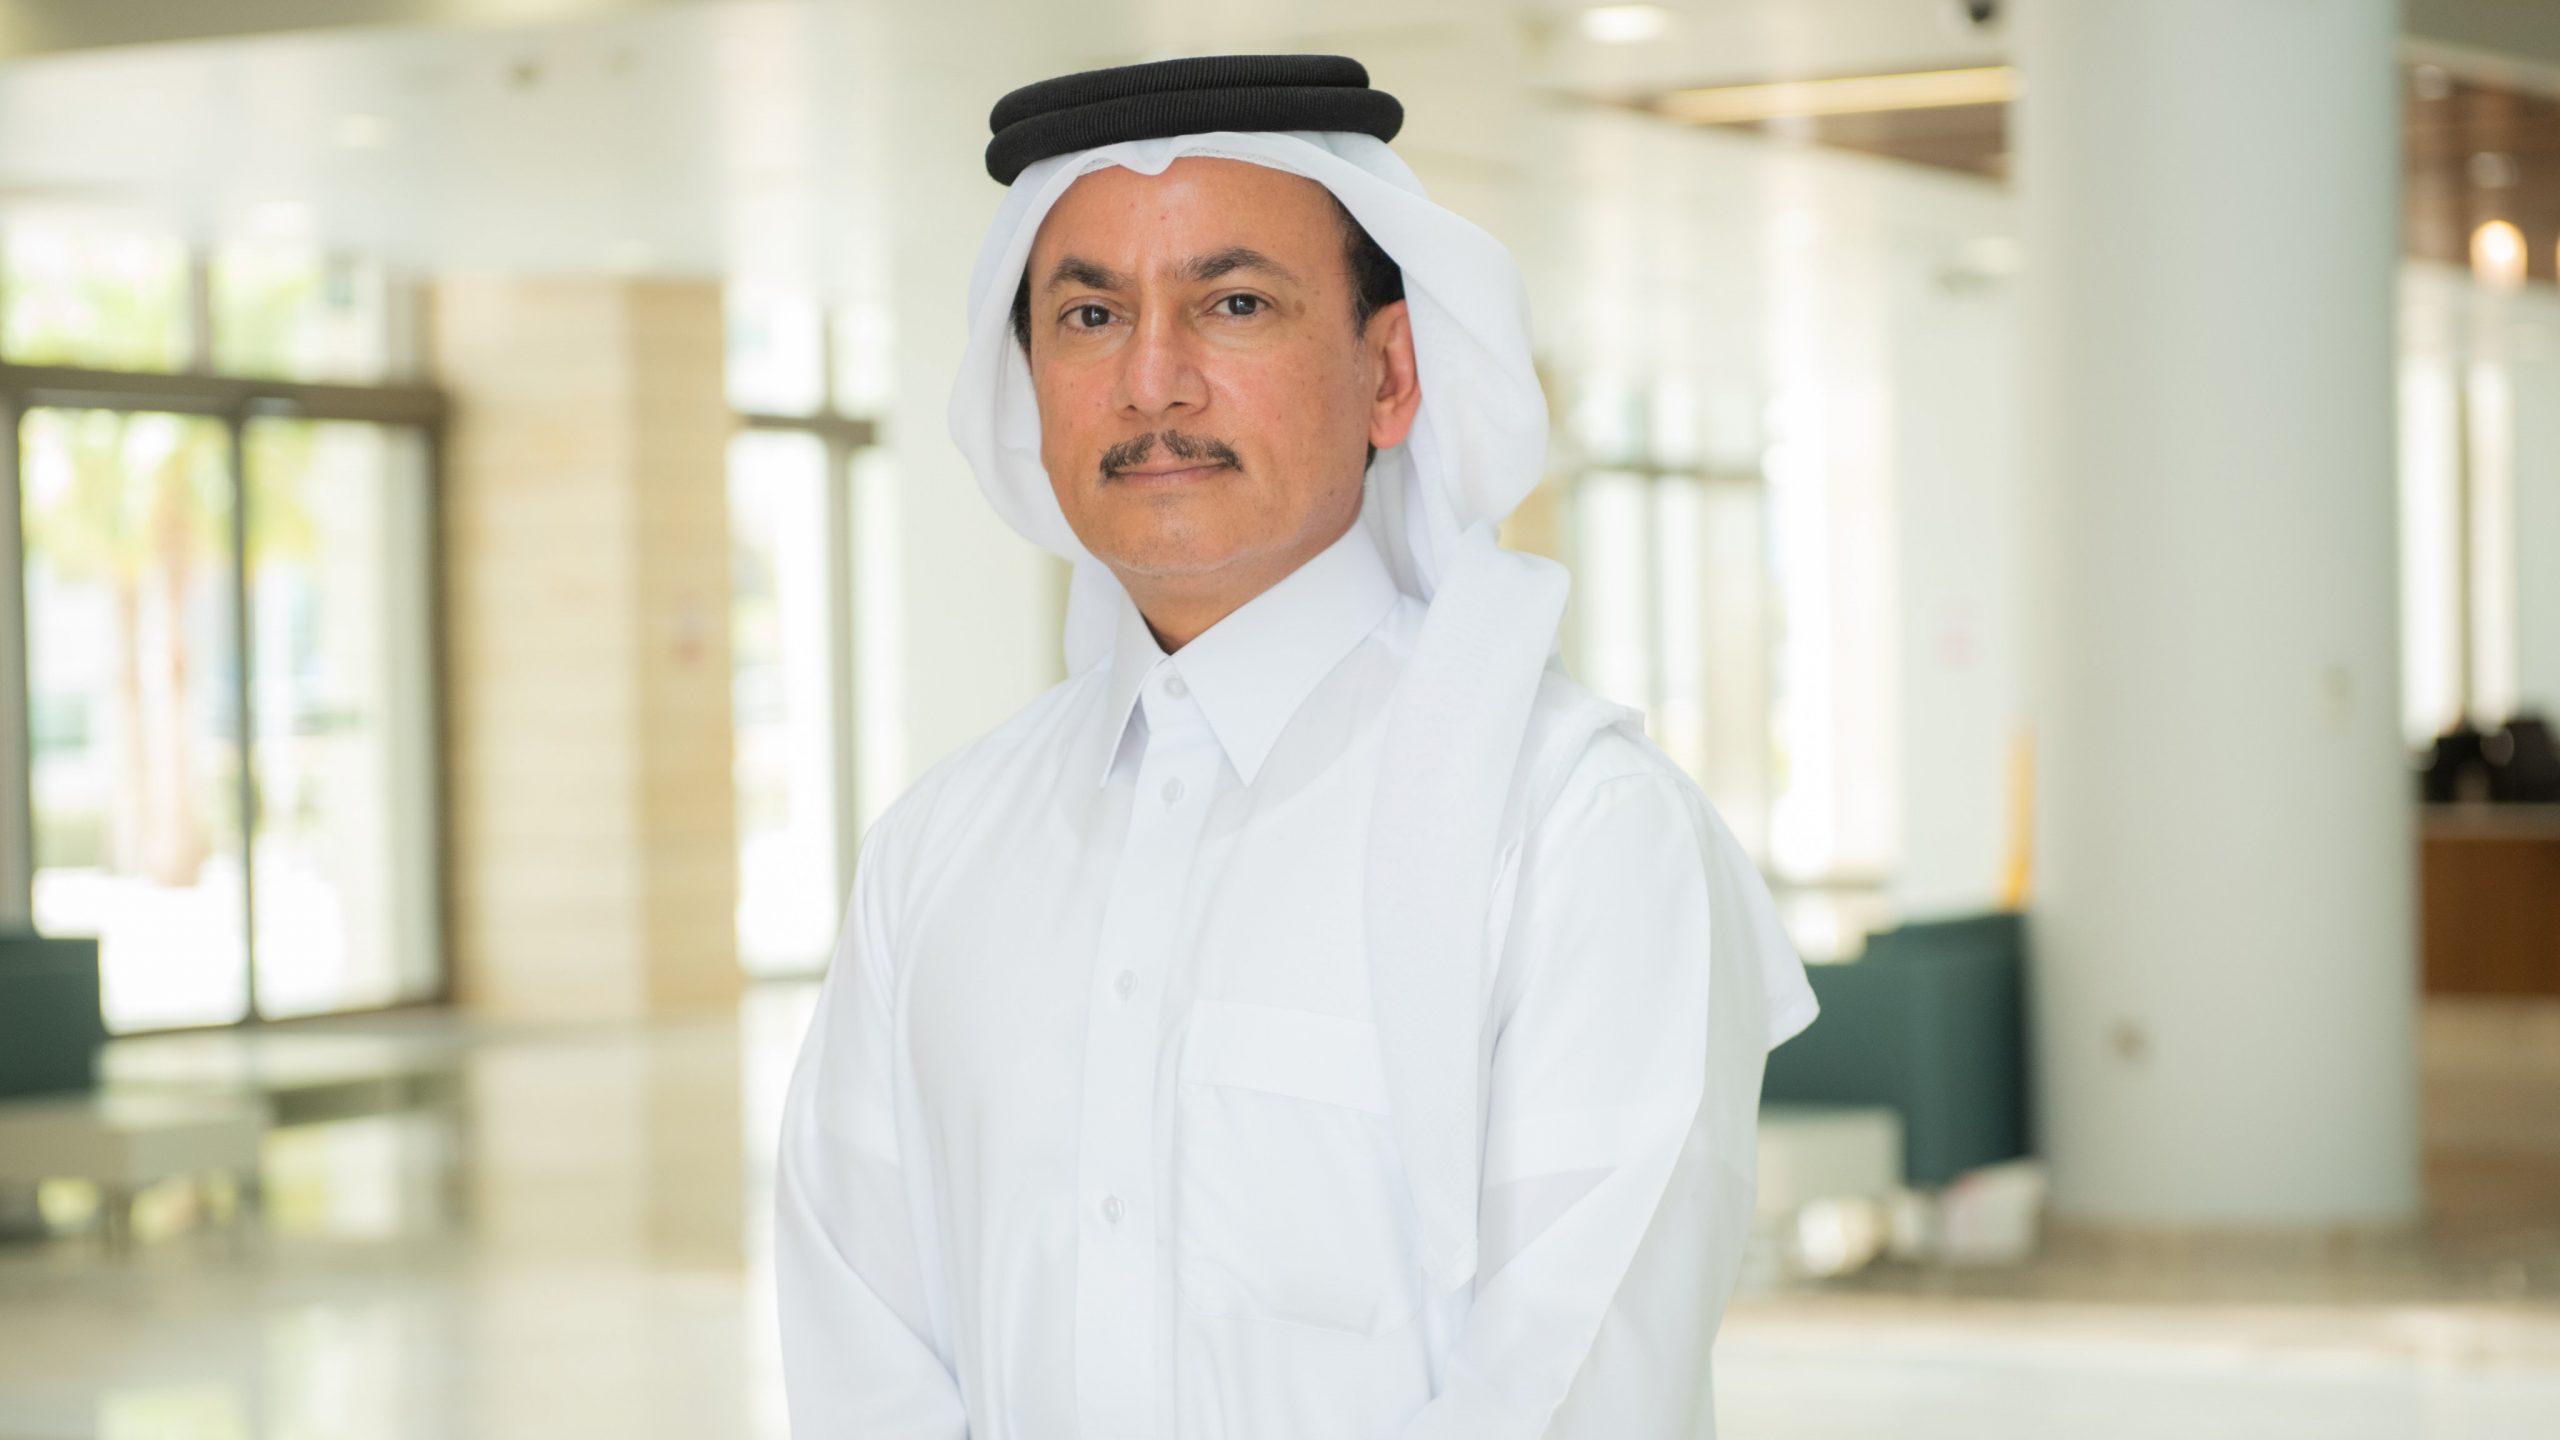 Al Diplomacy Magazine Focuses on Qatar's Efforts Regarding COVID-19